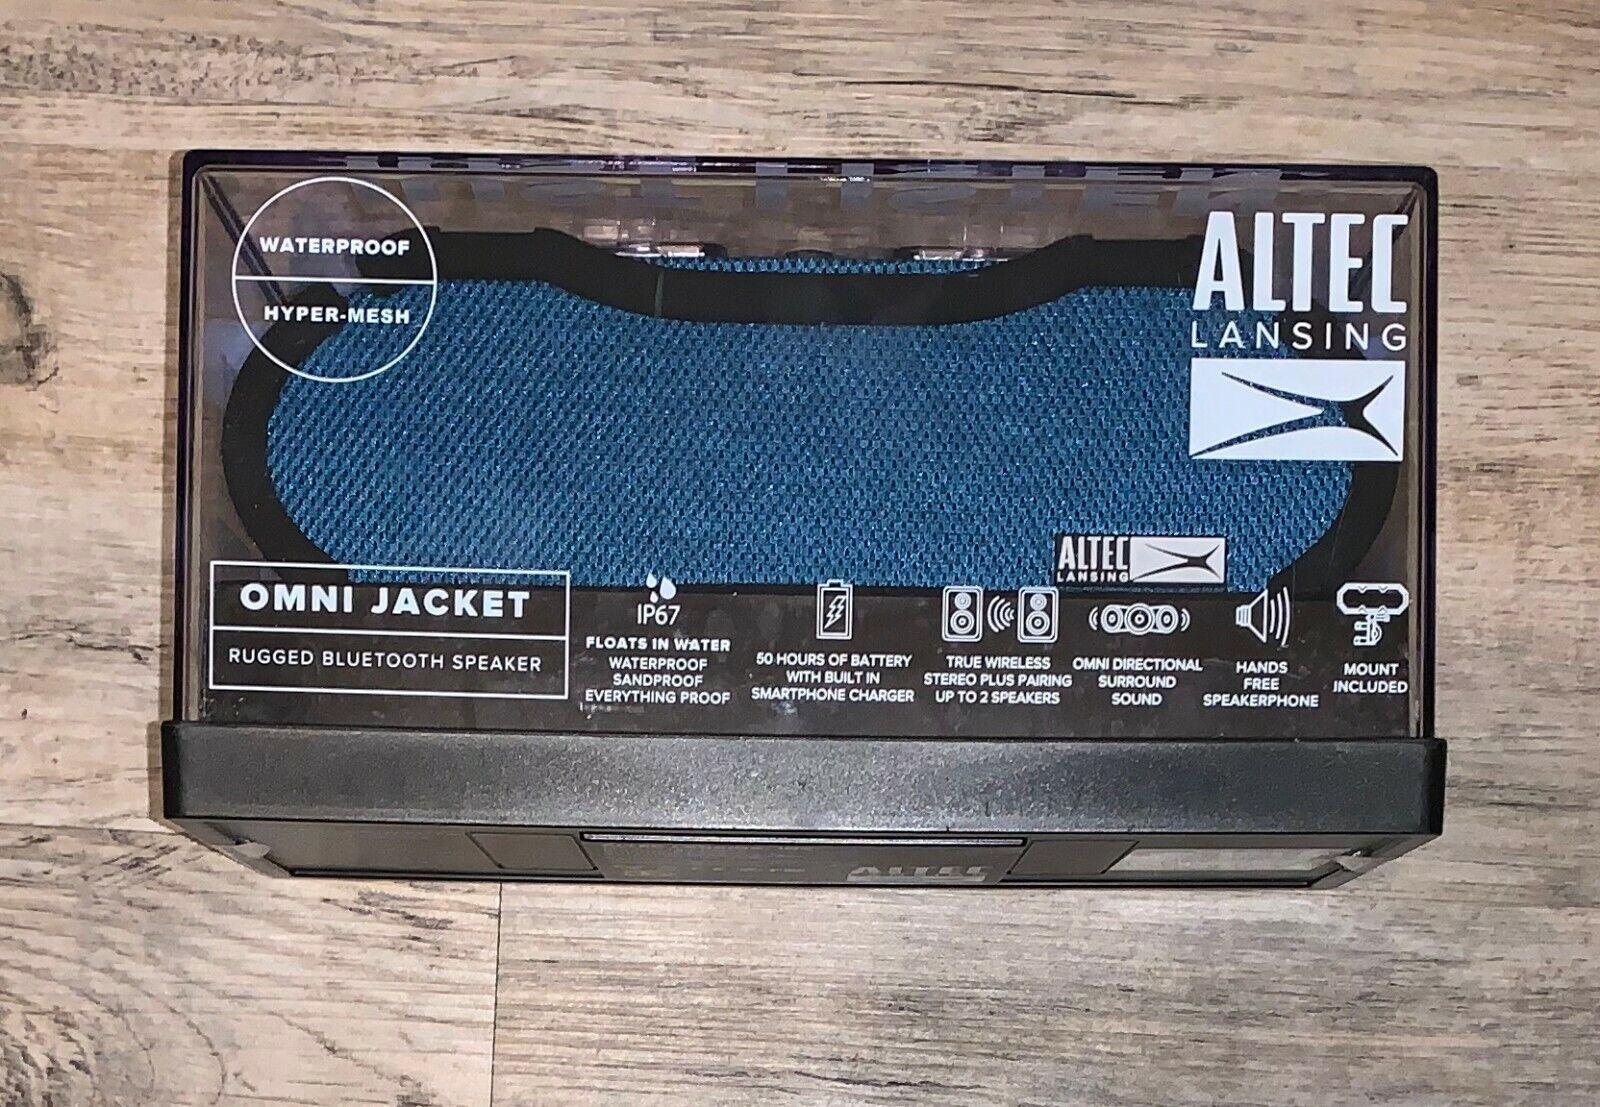 Altec Lansing IMW678-BLU Omni Jacket Wireless NFC Speaker, B